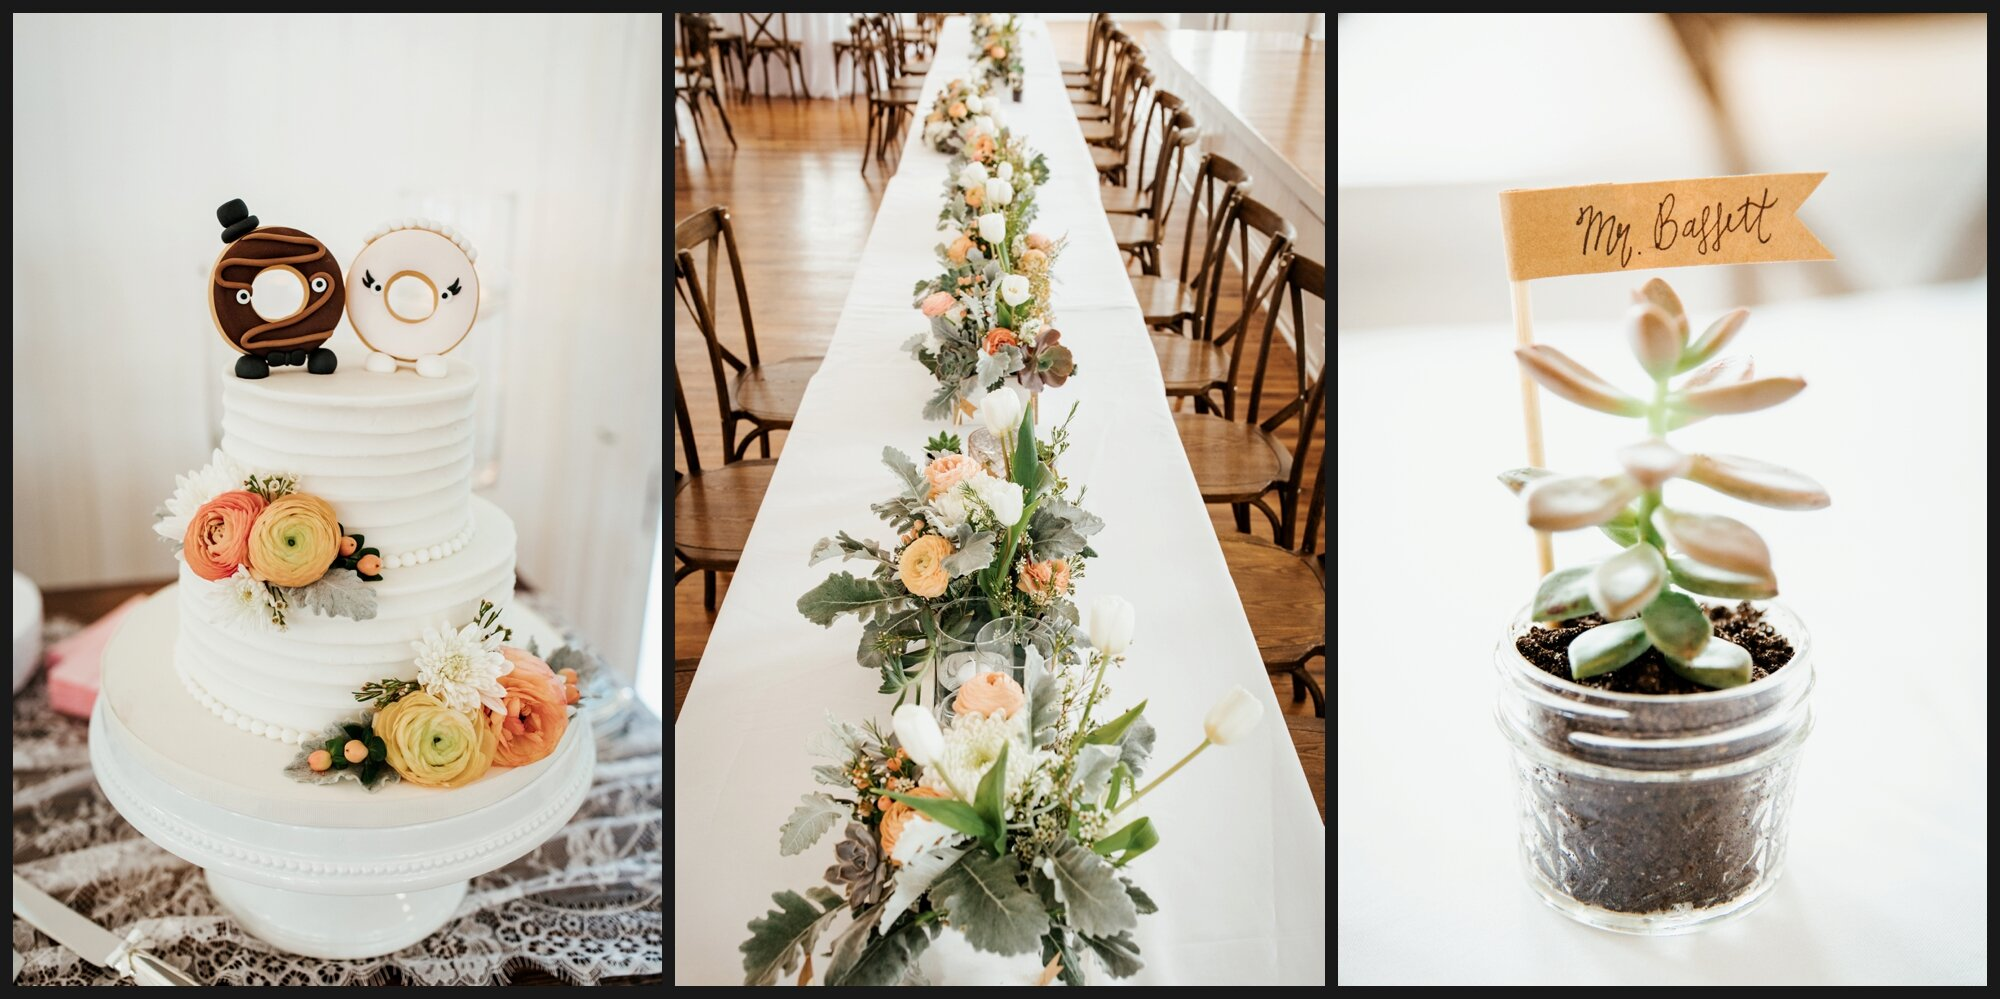 Orlando-Wedding-Photographer-destination-wedding-photographer-florida-wedding-photographer-hawaii-wedding-photographer_0634.jpg